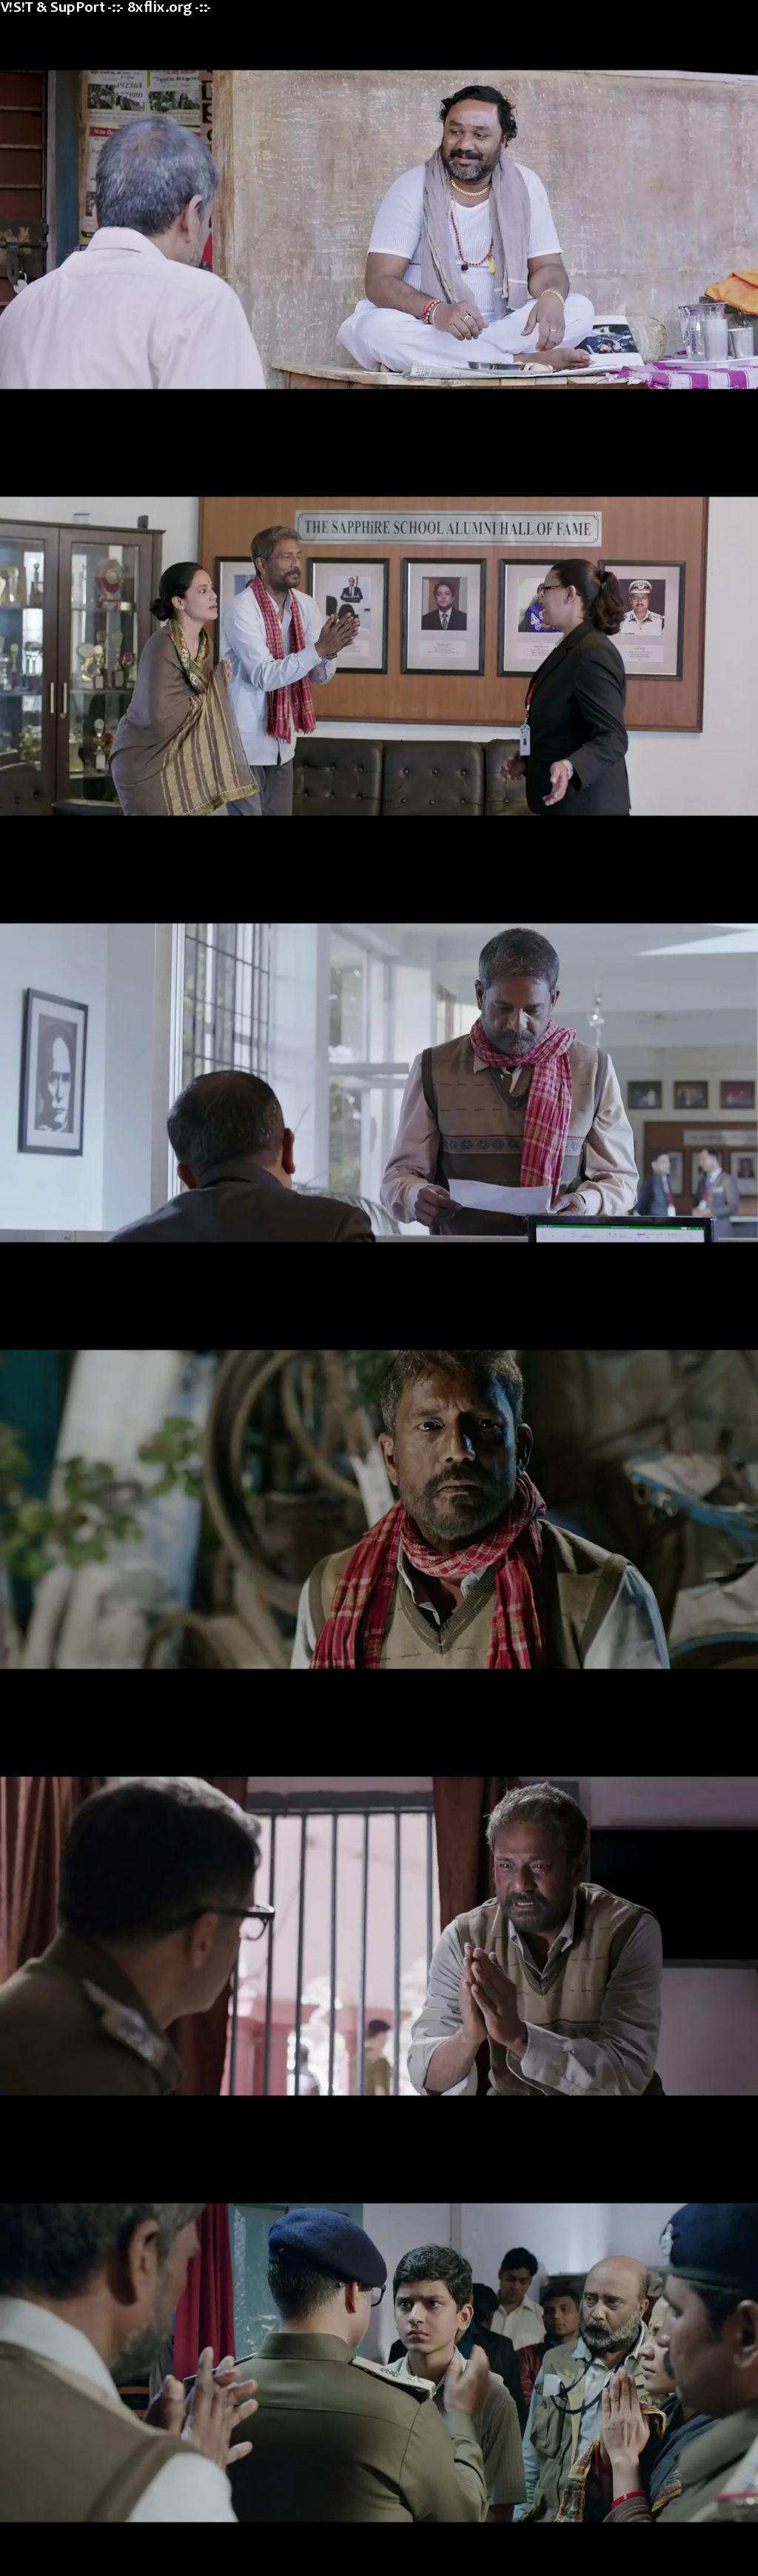 Pareeksha 2020 Full Hindi Movie Download 720p 480p Web-DL HD